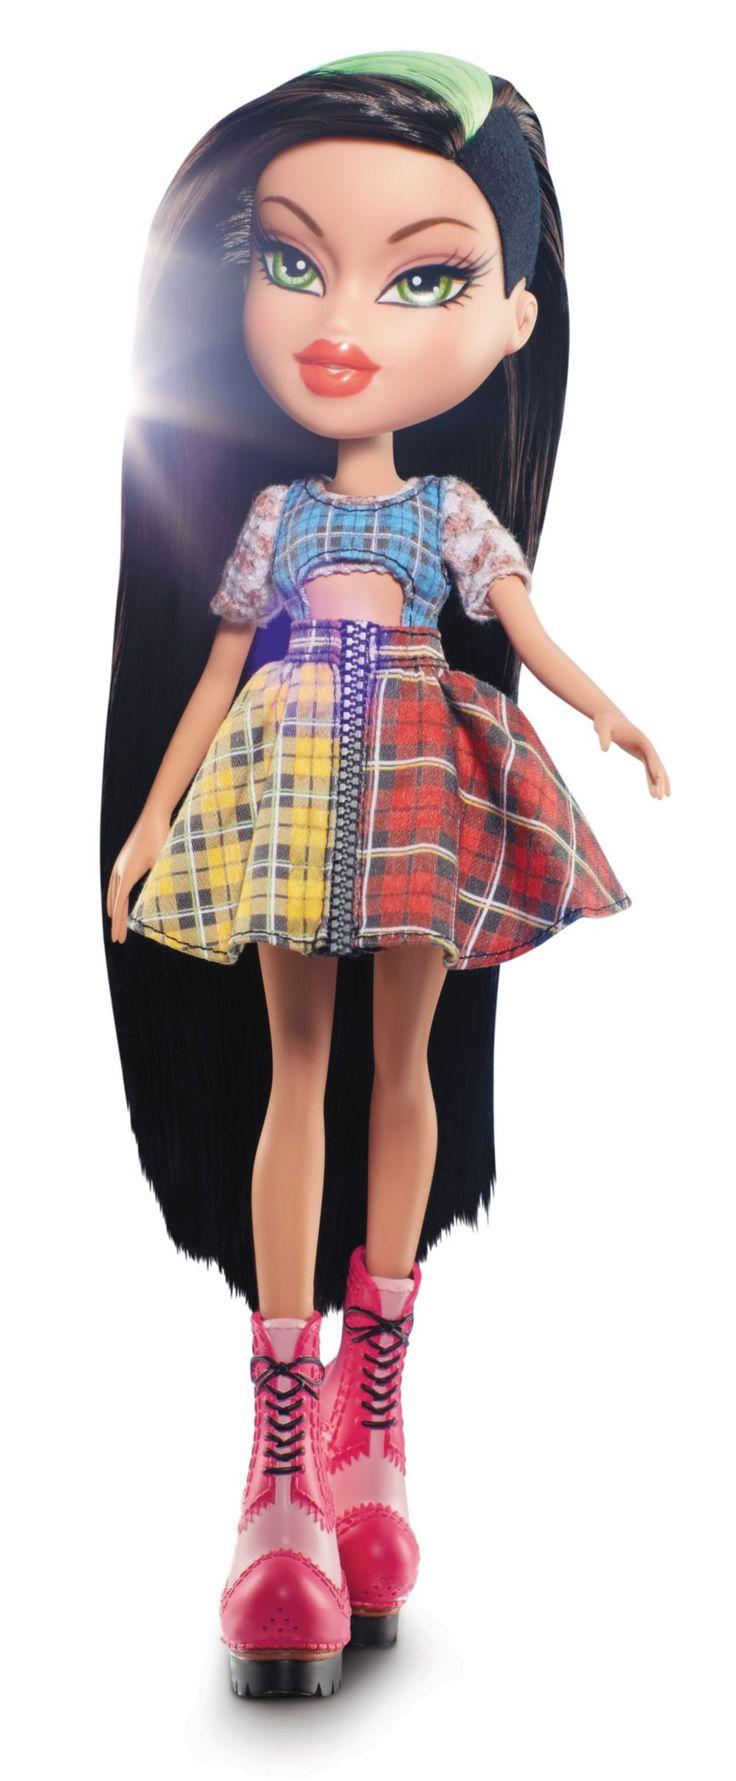 88 best images about Bratz Dolls on Pinterest | Slumber ...